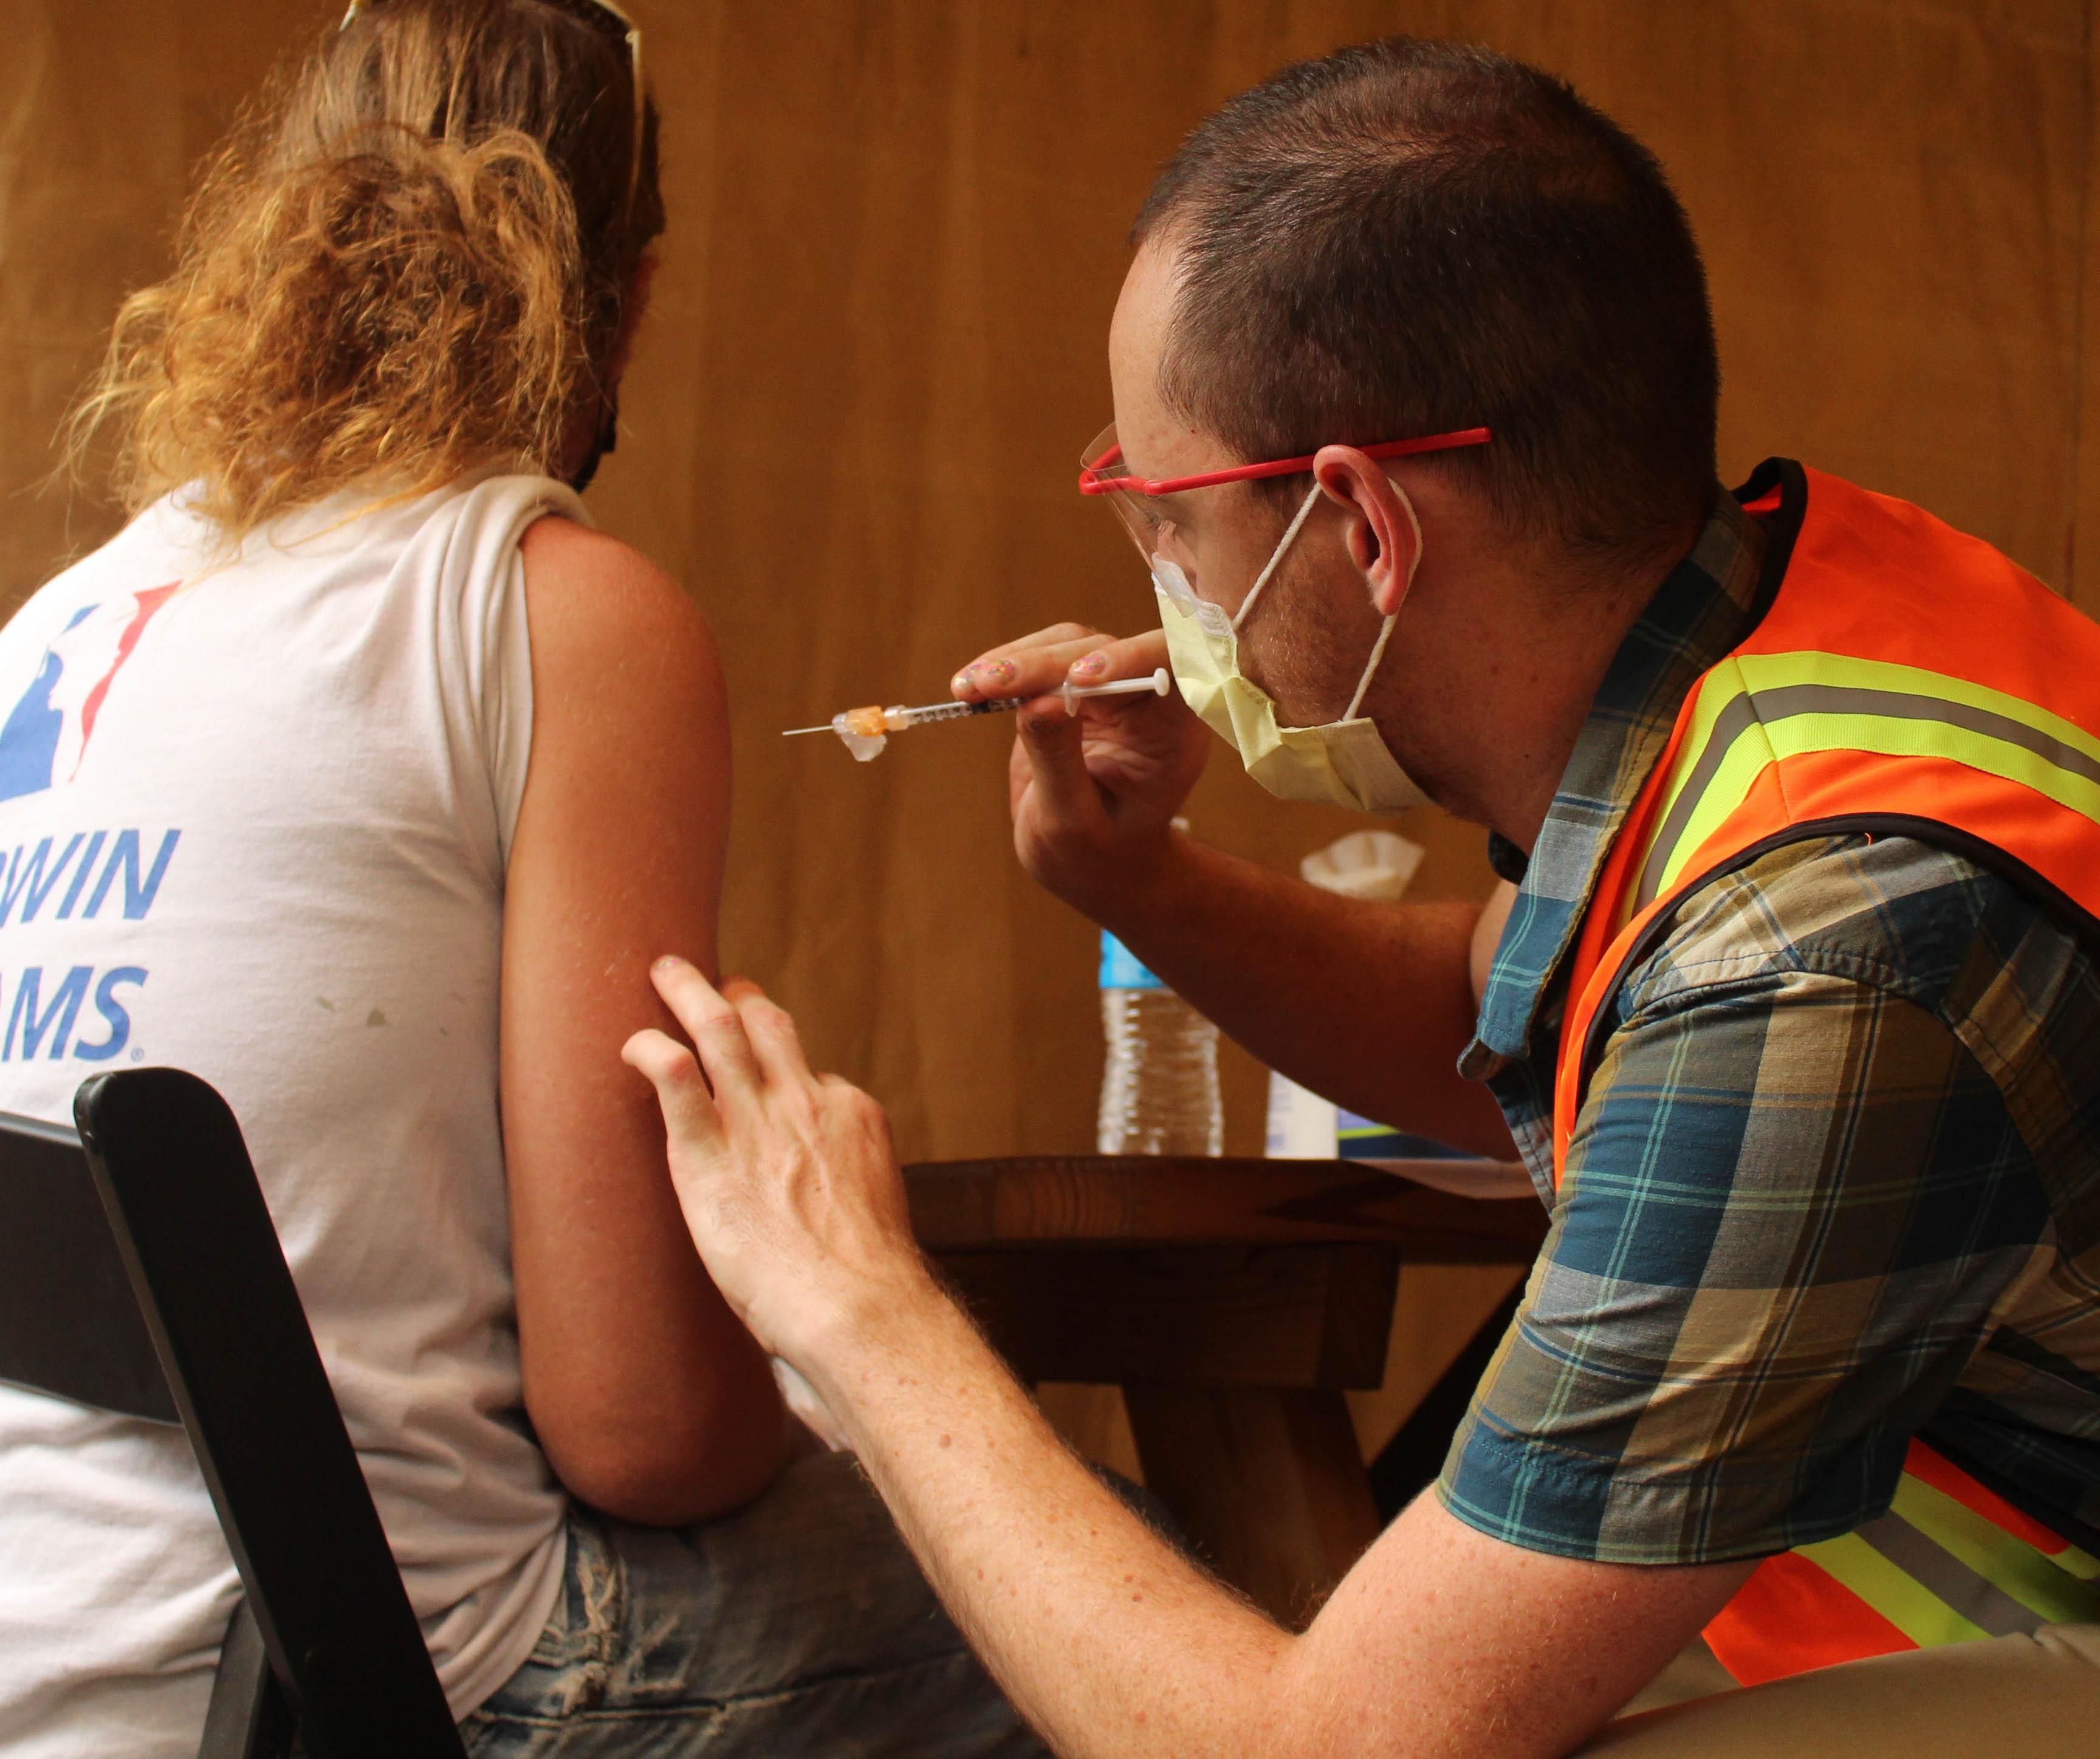 An OHSU technician is preparing to vaccinate Don Atkinson.